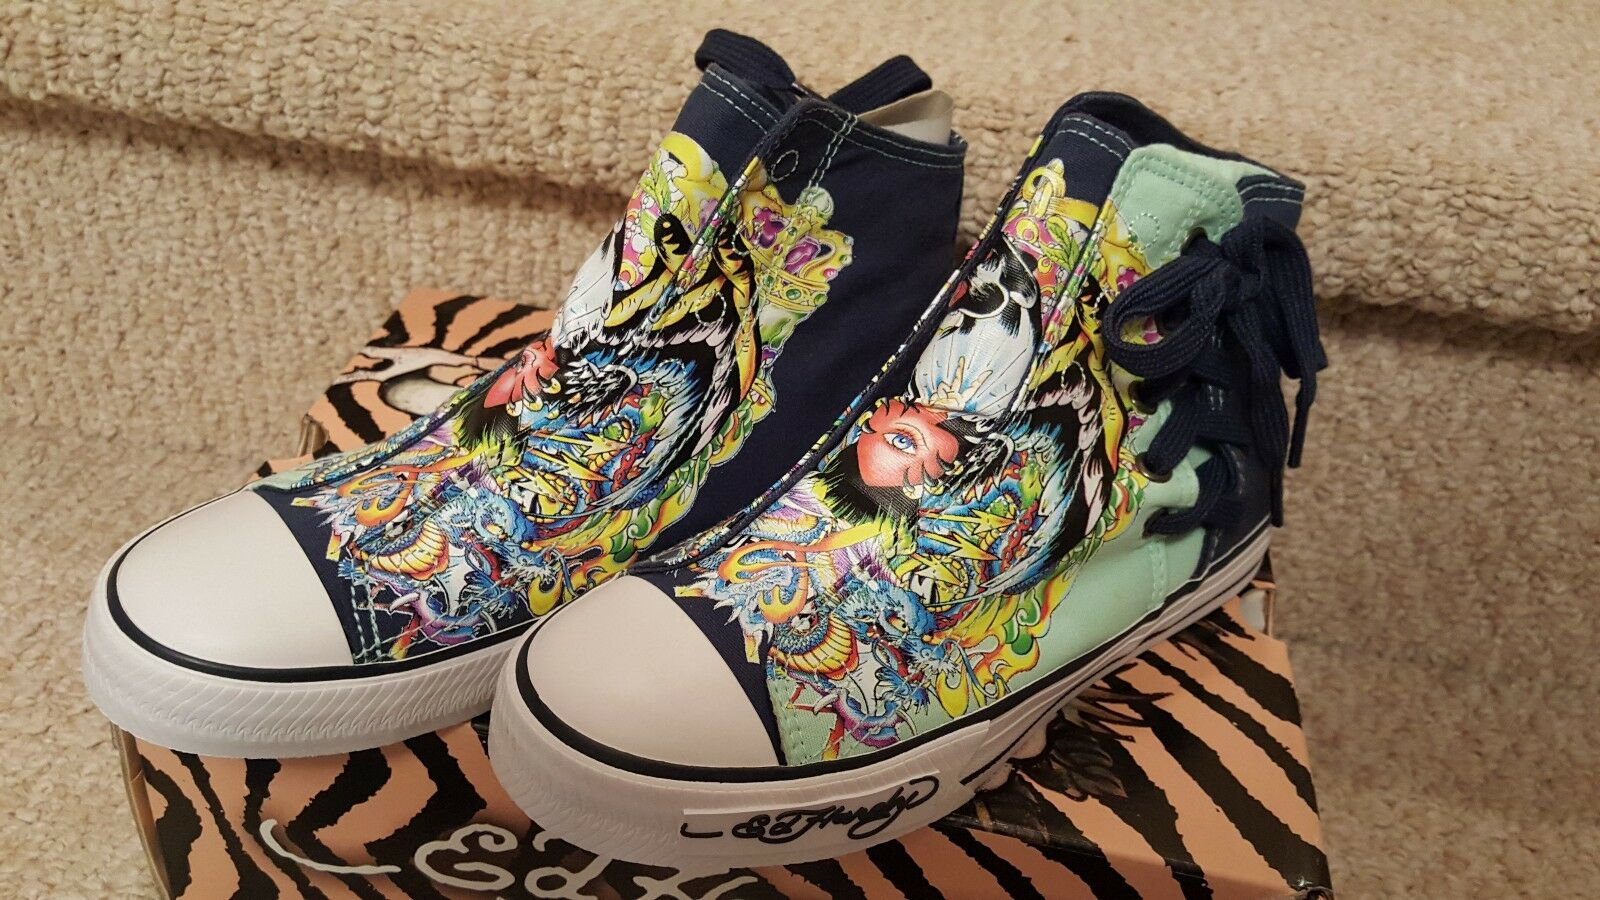 Ed Hardy Women's Highrise Los Feliz Blue Panther Tattoo Shoes US Size 6 Eur 37